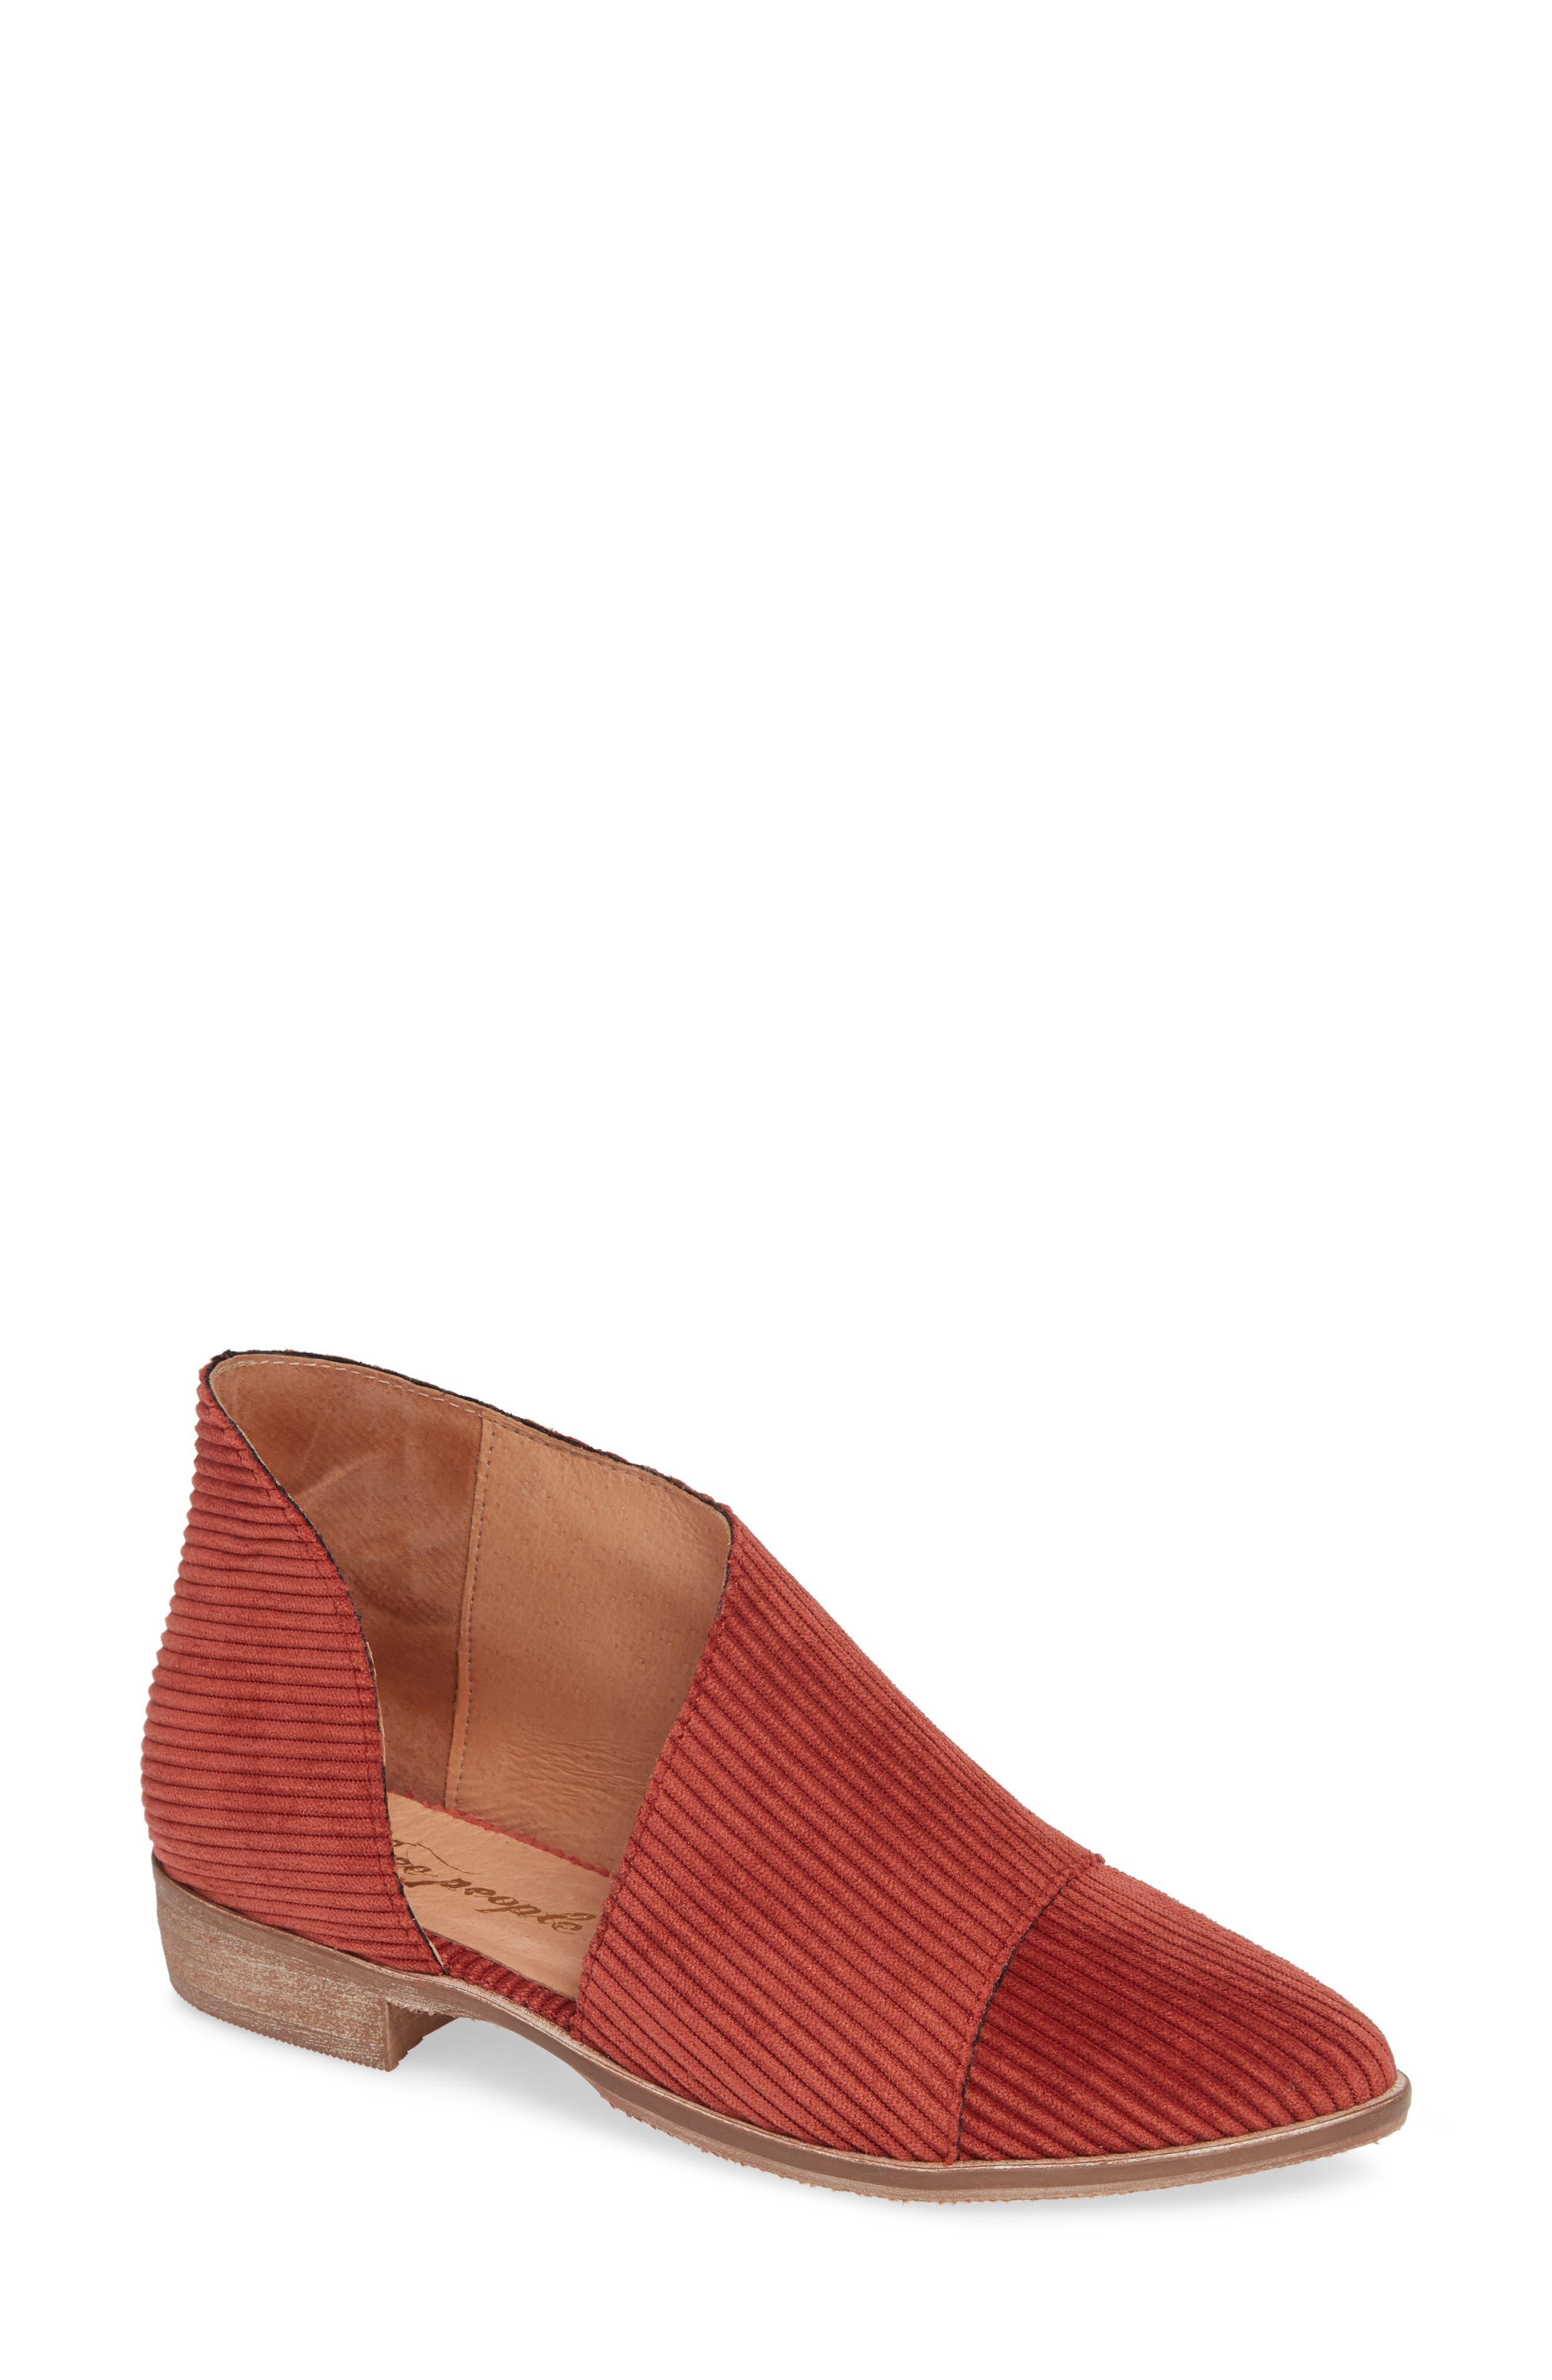 'Royale' Pointy Toe Flat,                         Main,                         color, Burnt Orange